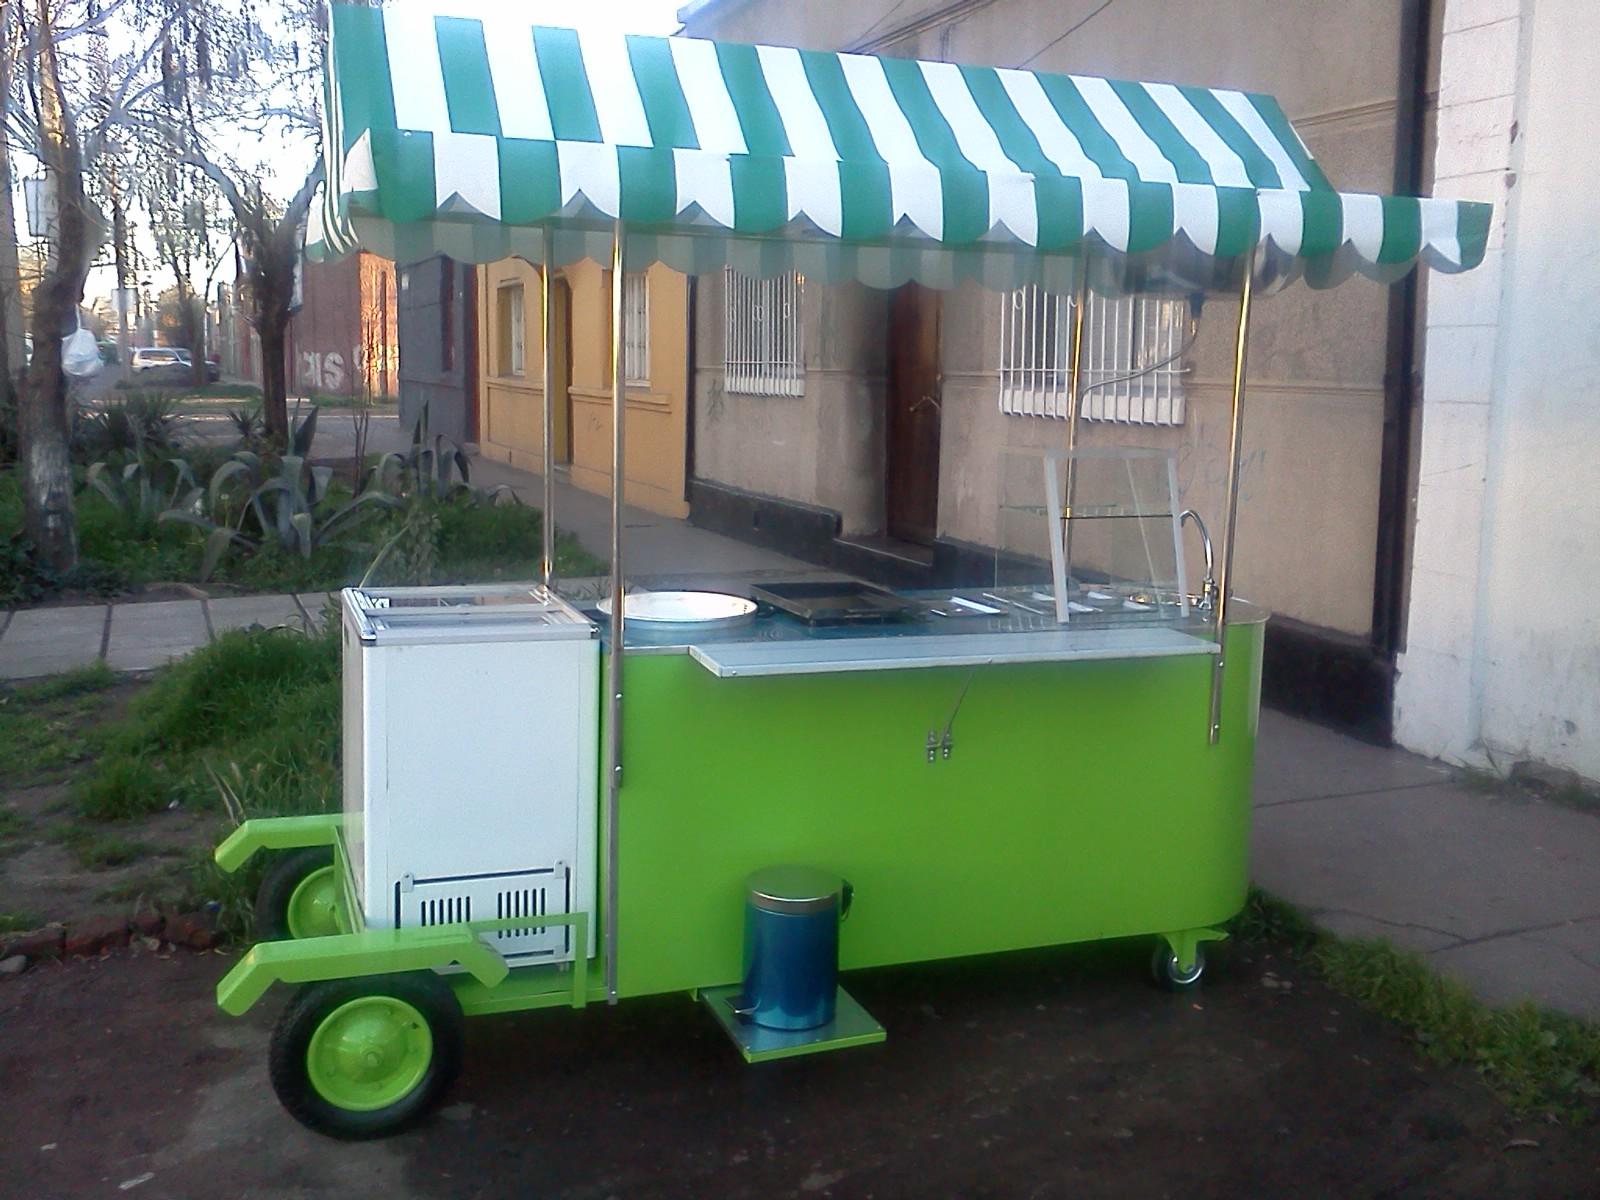 Carros de comida rapida completos fritura mote churrascos for Compro estanque de agua